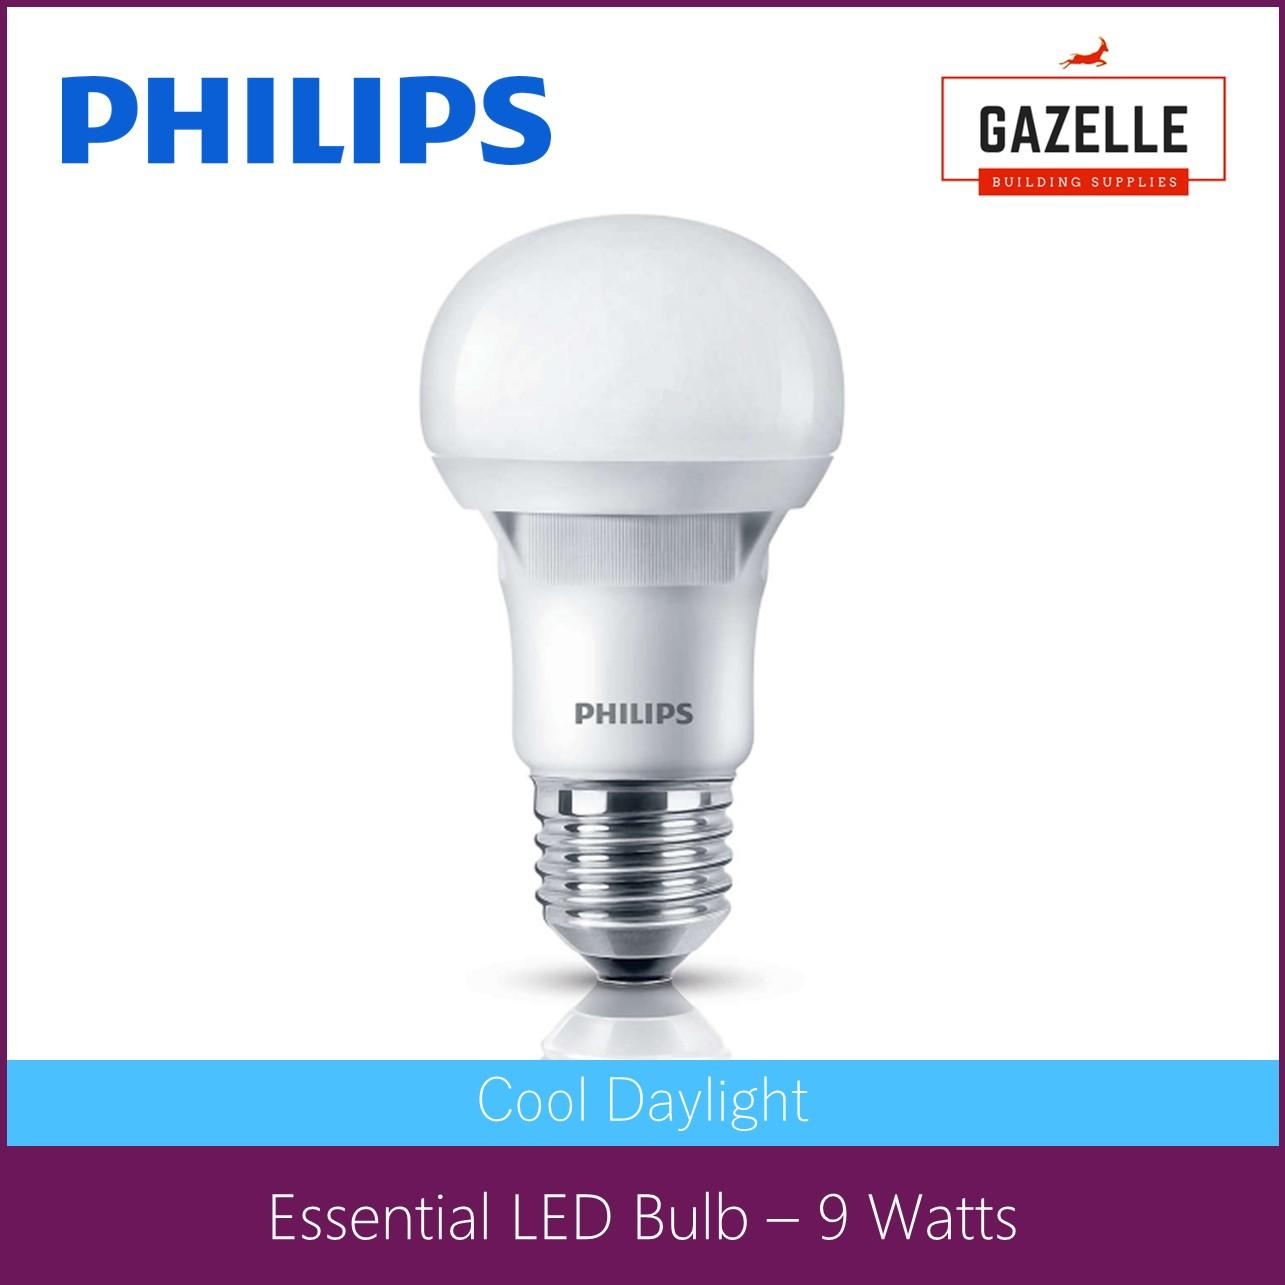 Philips Essential Daylight LED Bulb 9 Watts